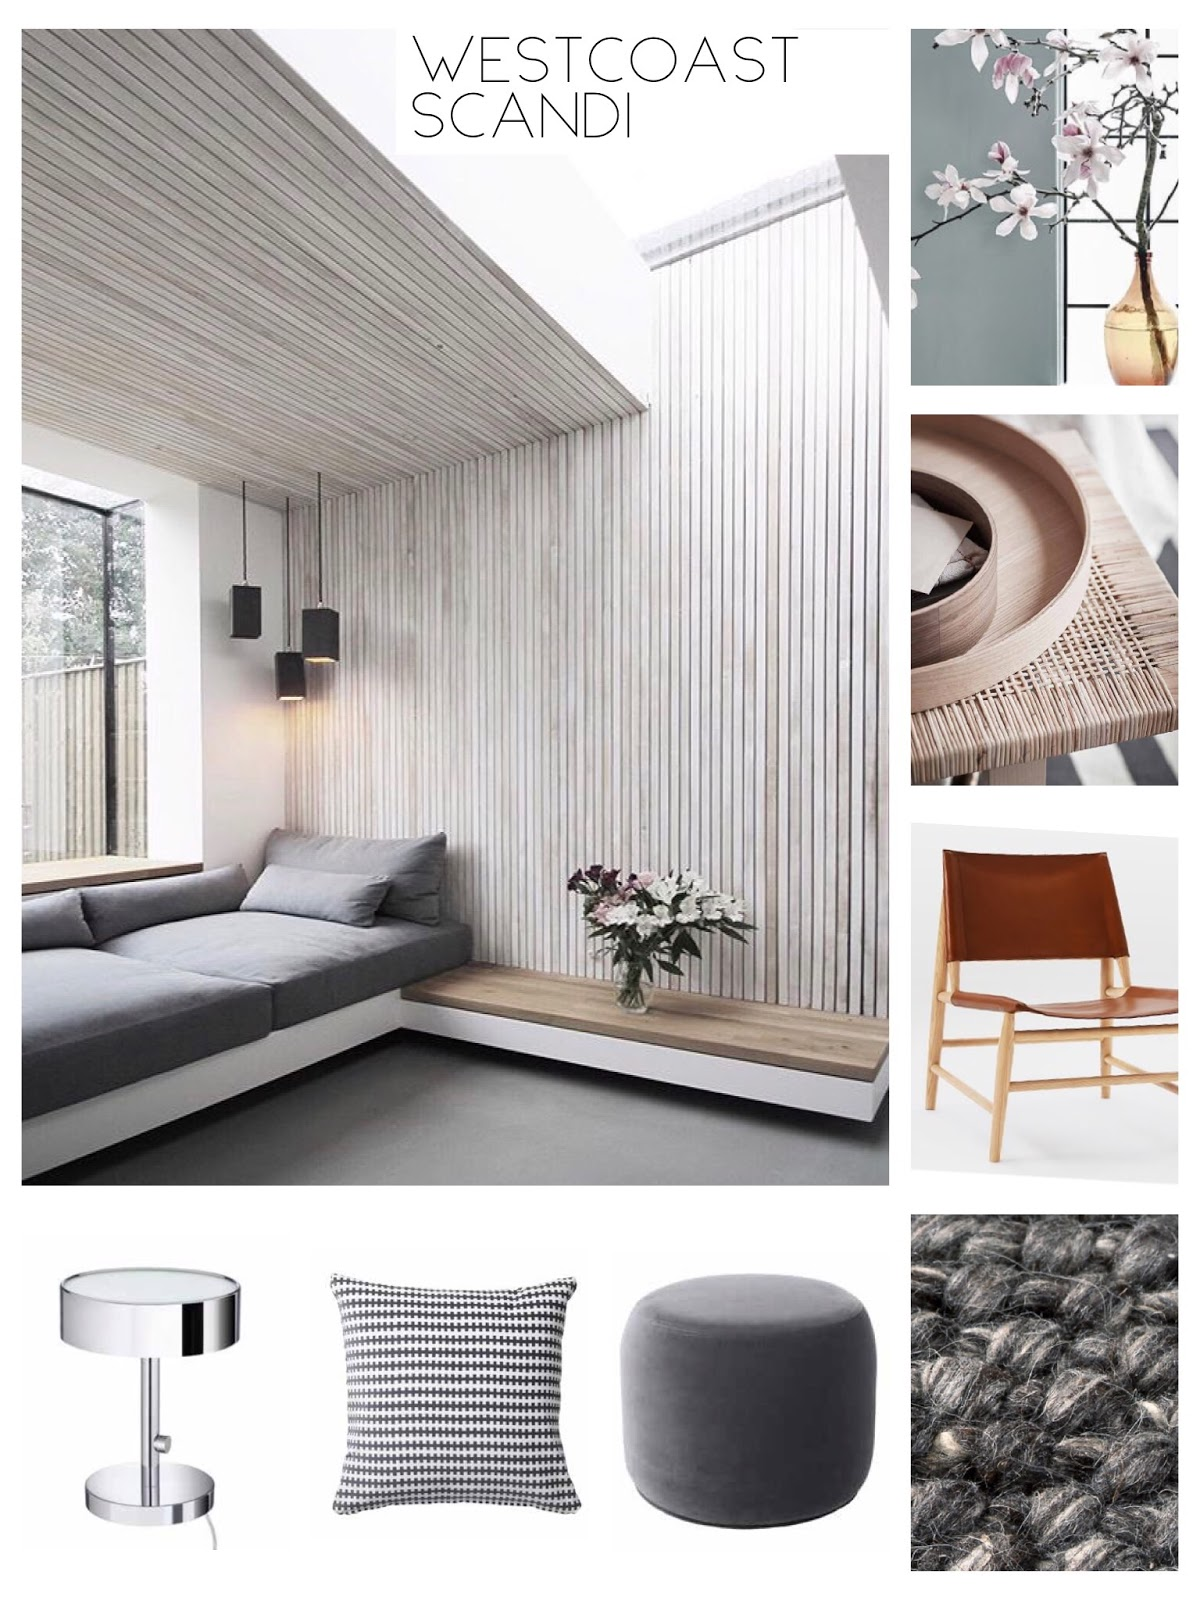 Ikea Soffbord Stockholm 2017 - Belysning Lampa